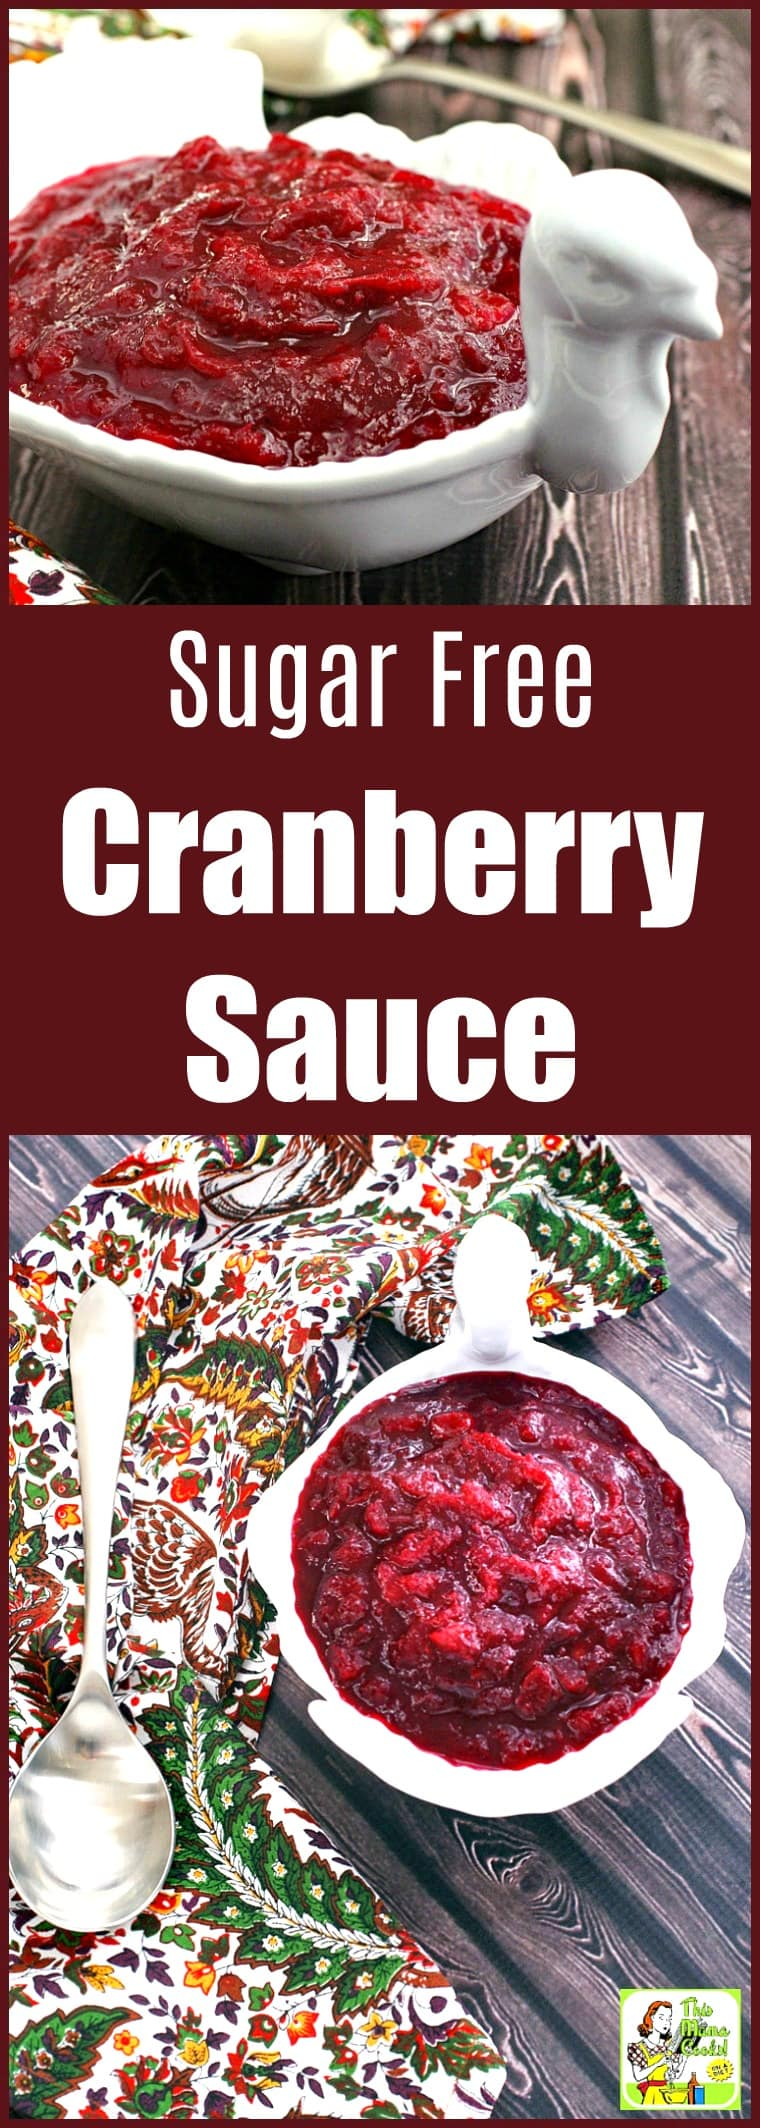 Sugar Free Cranberry Sauce Recipe